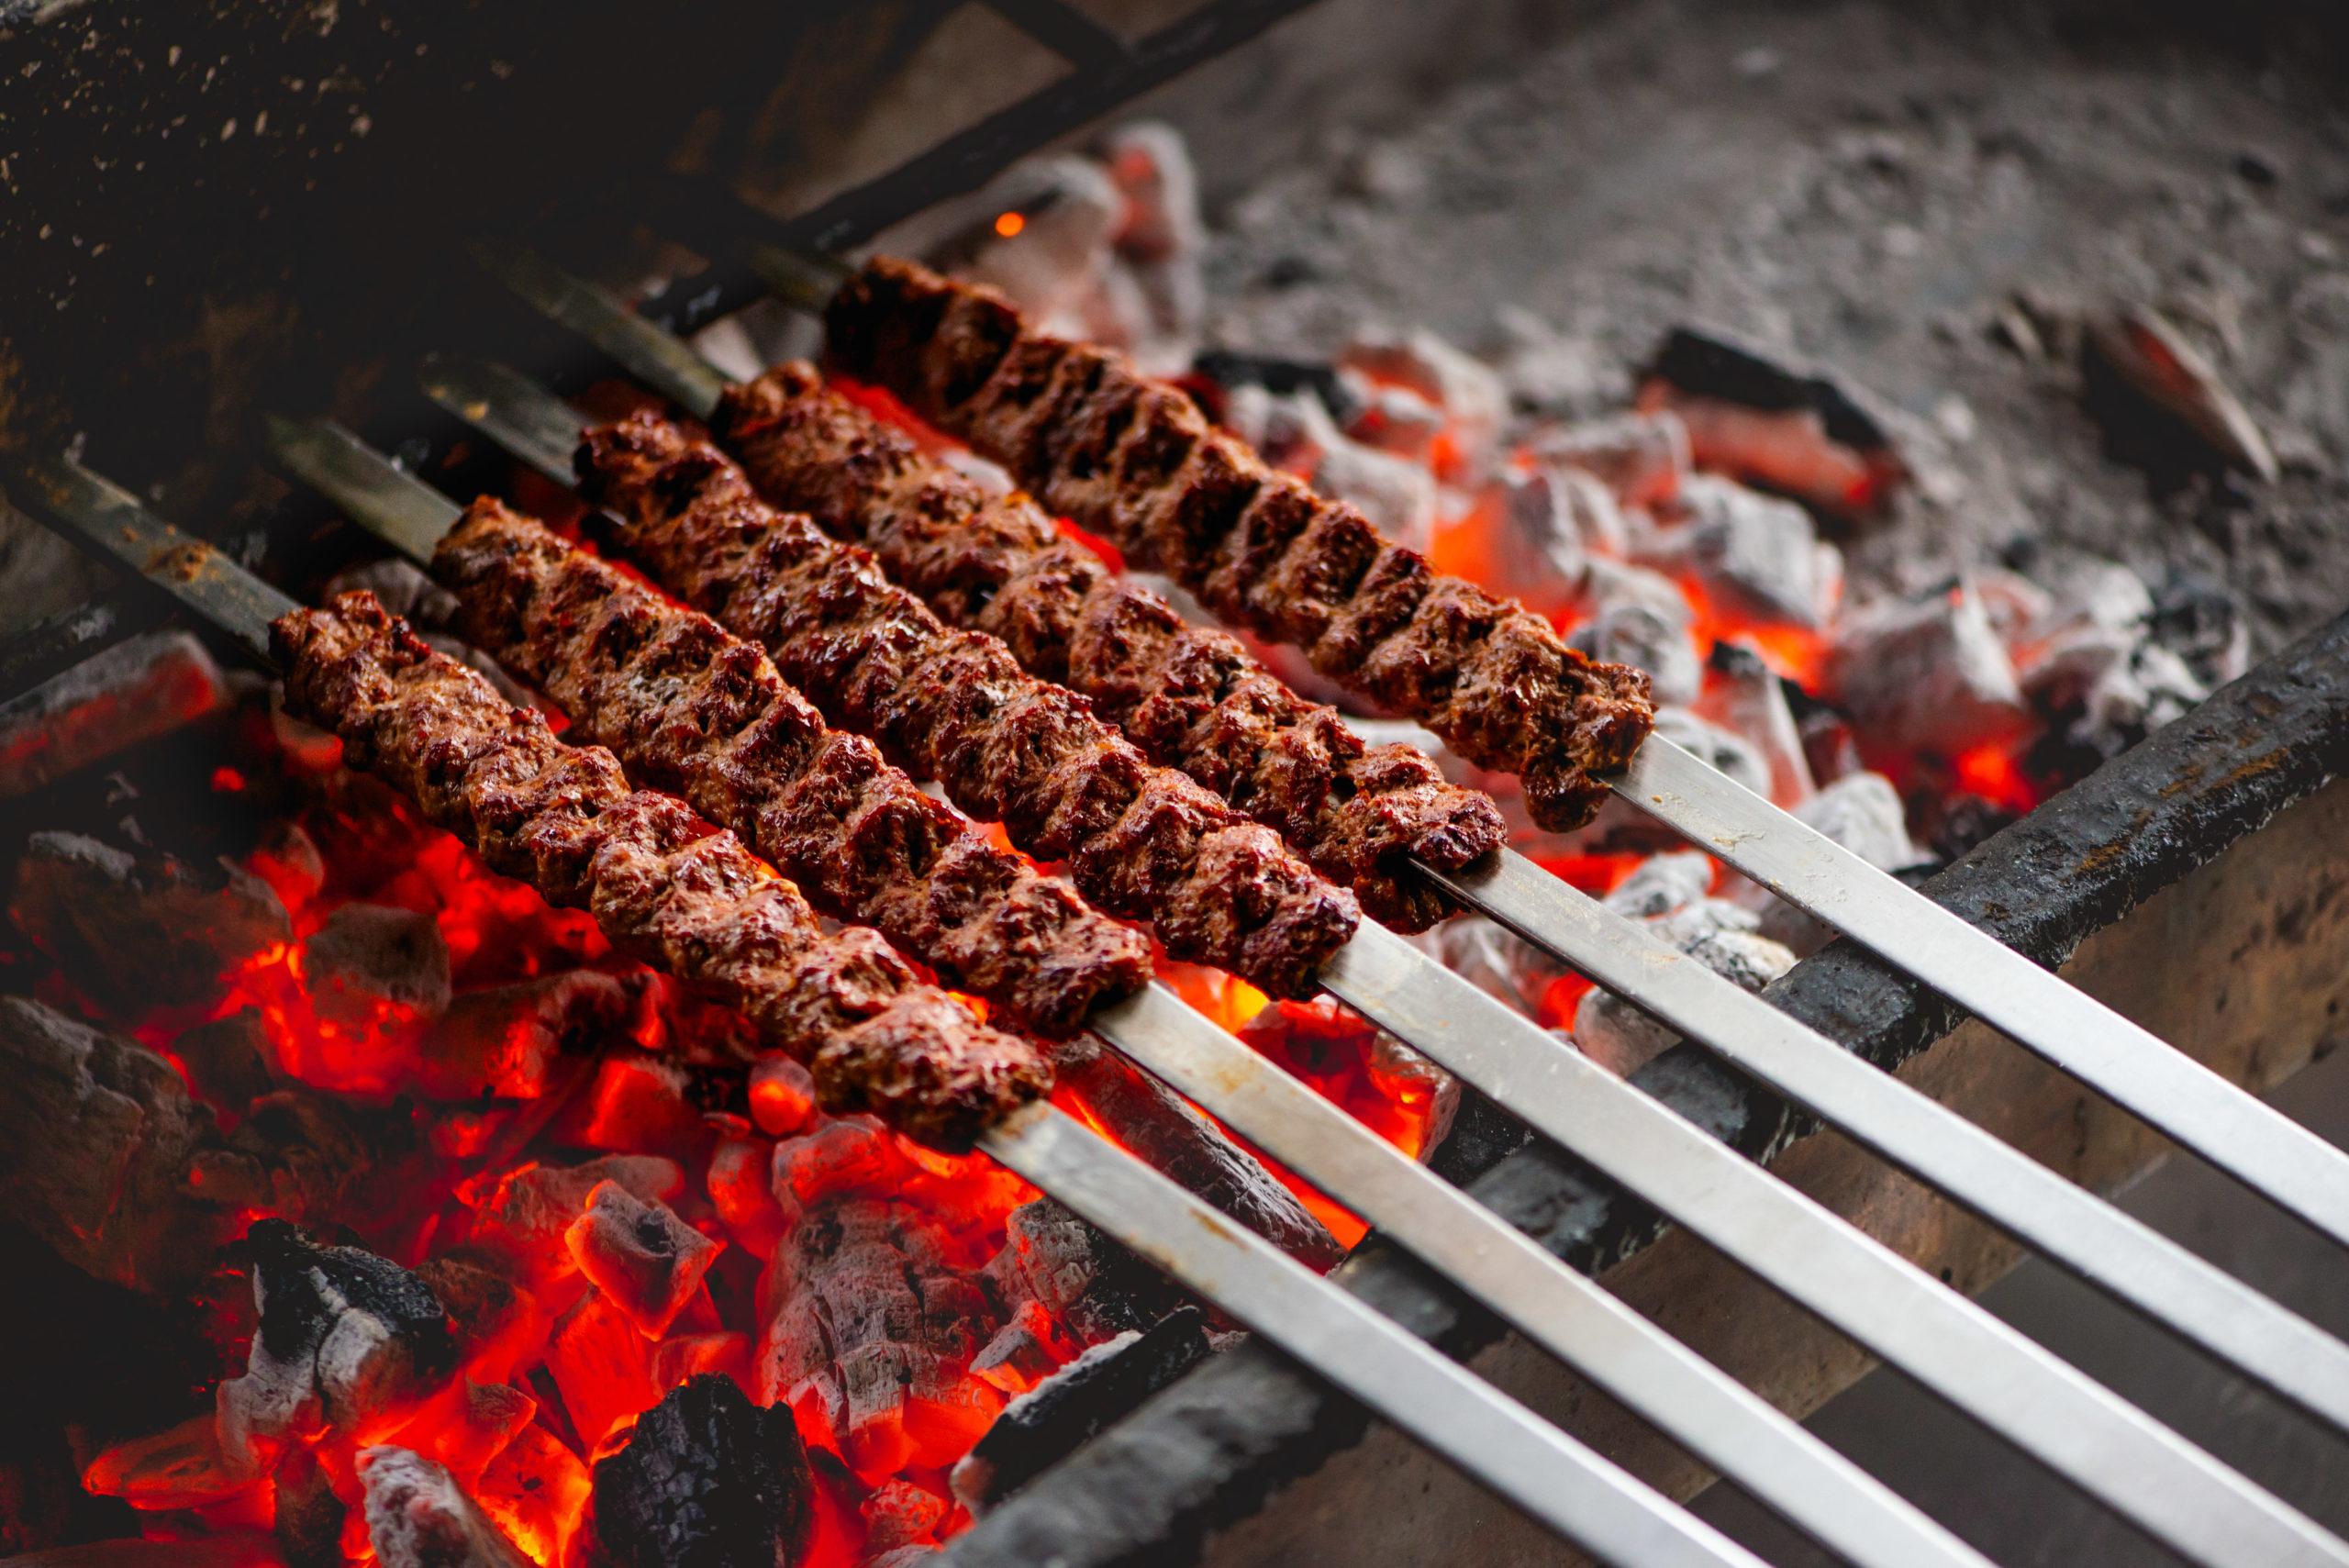 kebab Miras turkse barbecue Stefanie Spoelder Foodfotograaf foodfotografie food photography overijssel twente